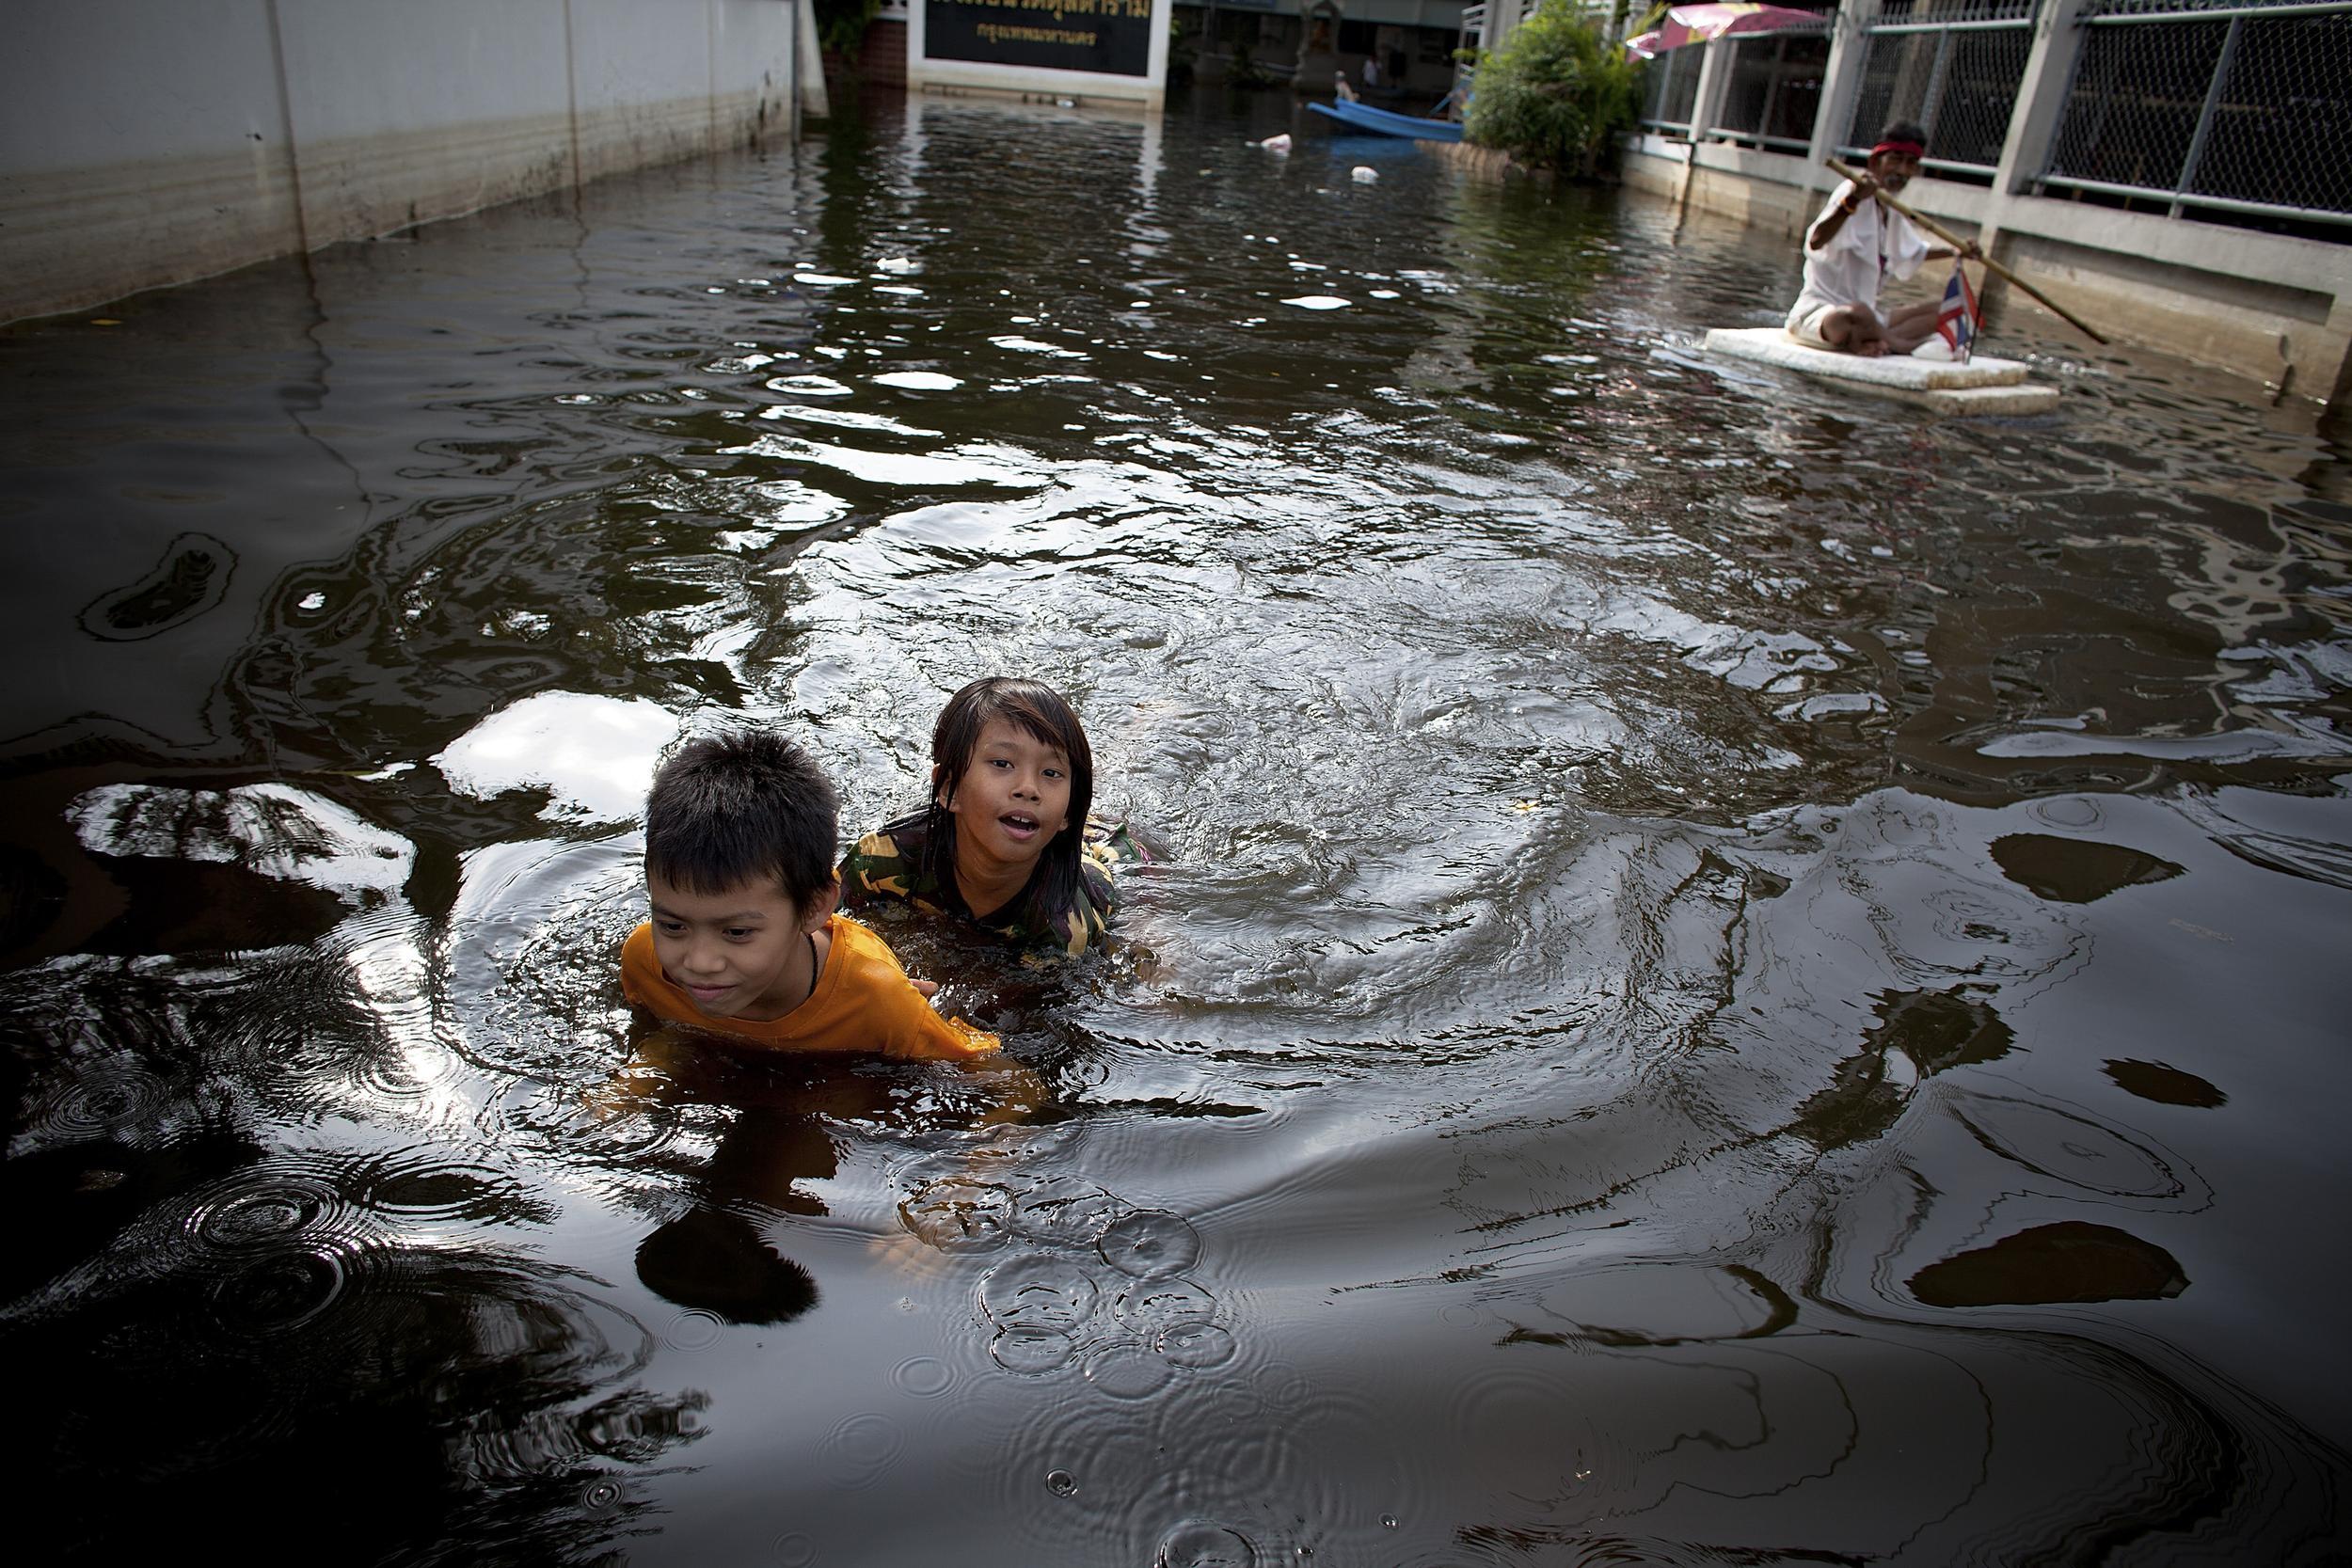 children in flooded area